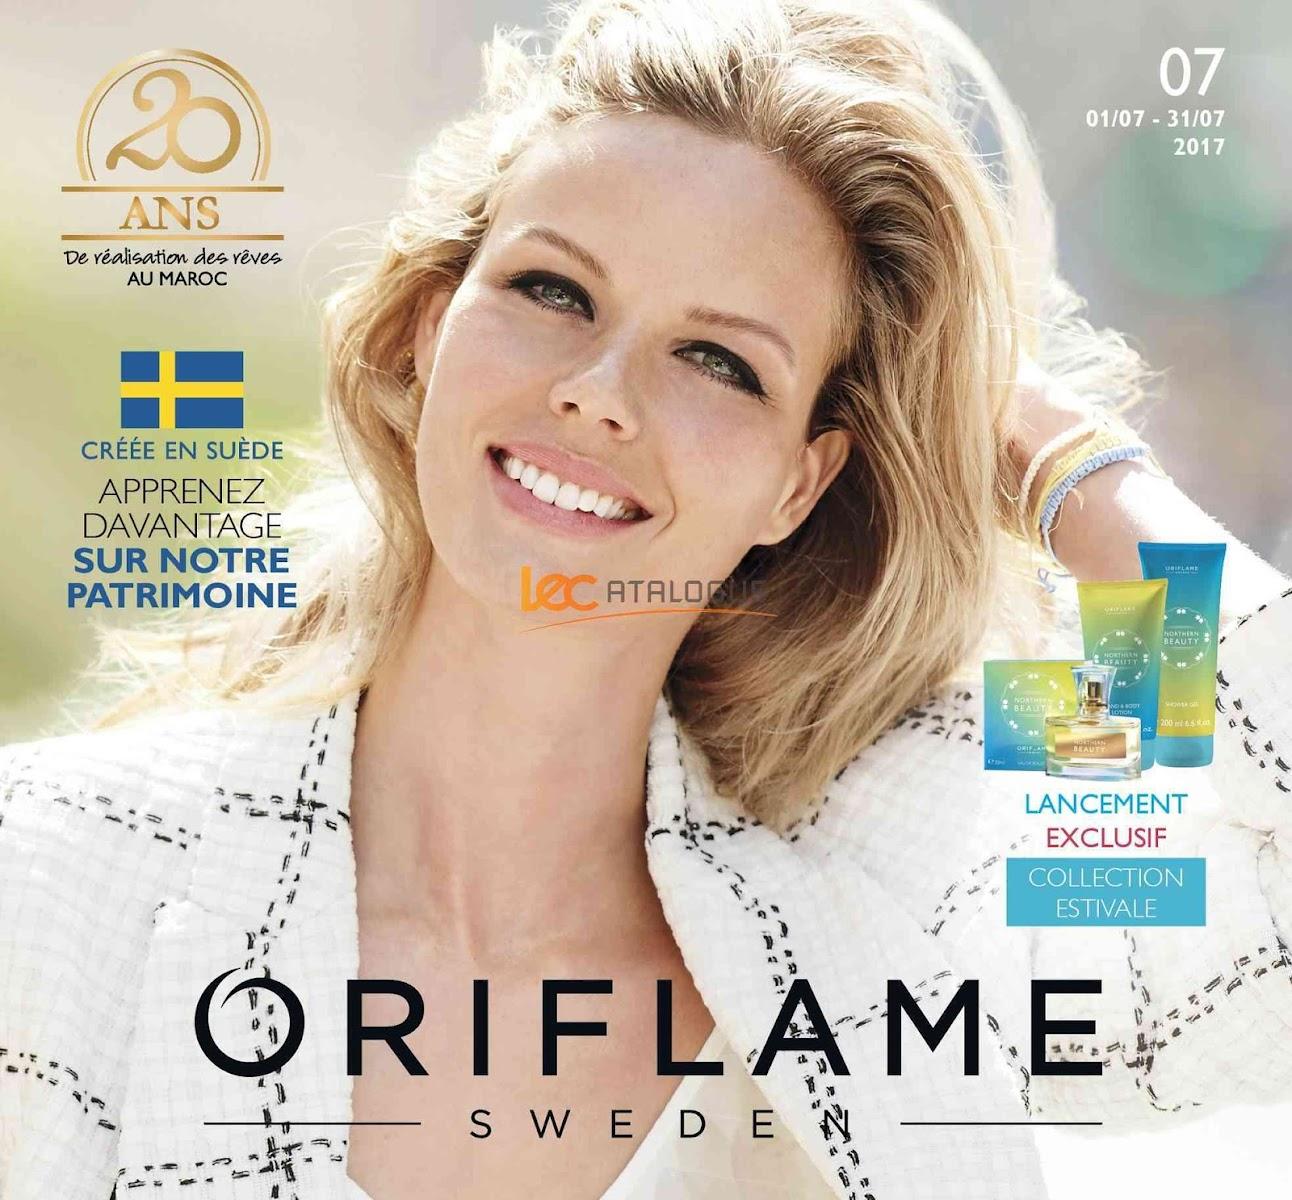 catalogue oriflame maroc juillet 2017